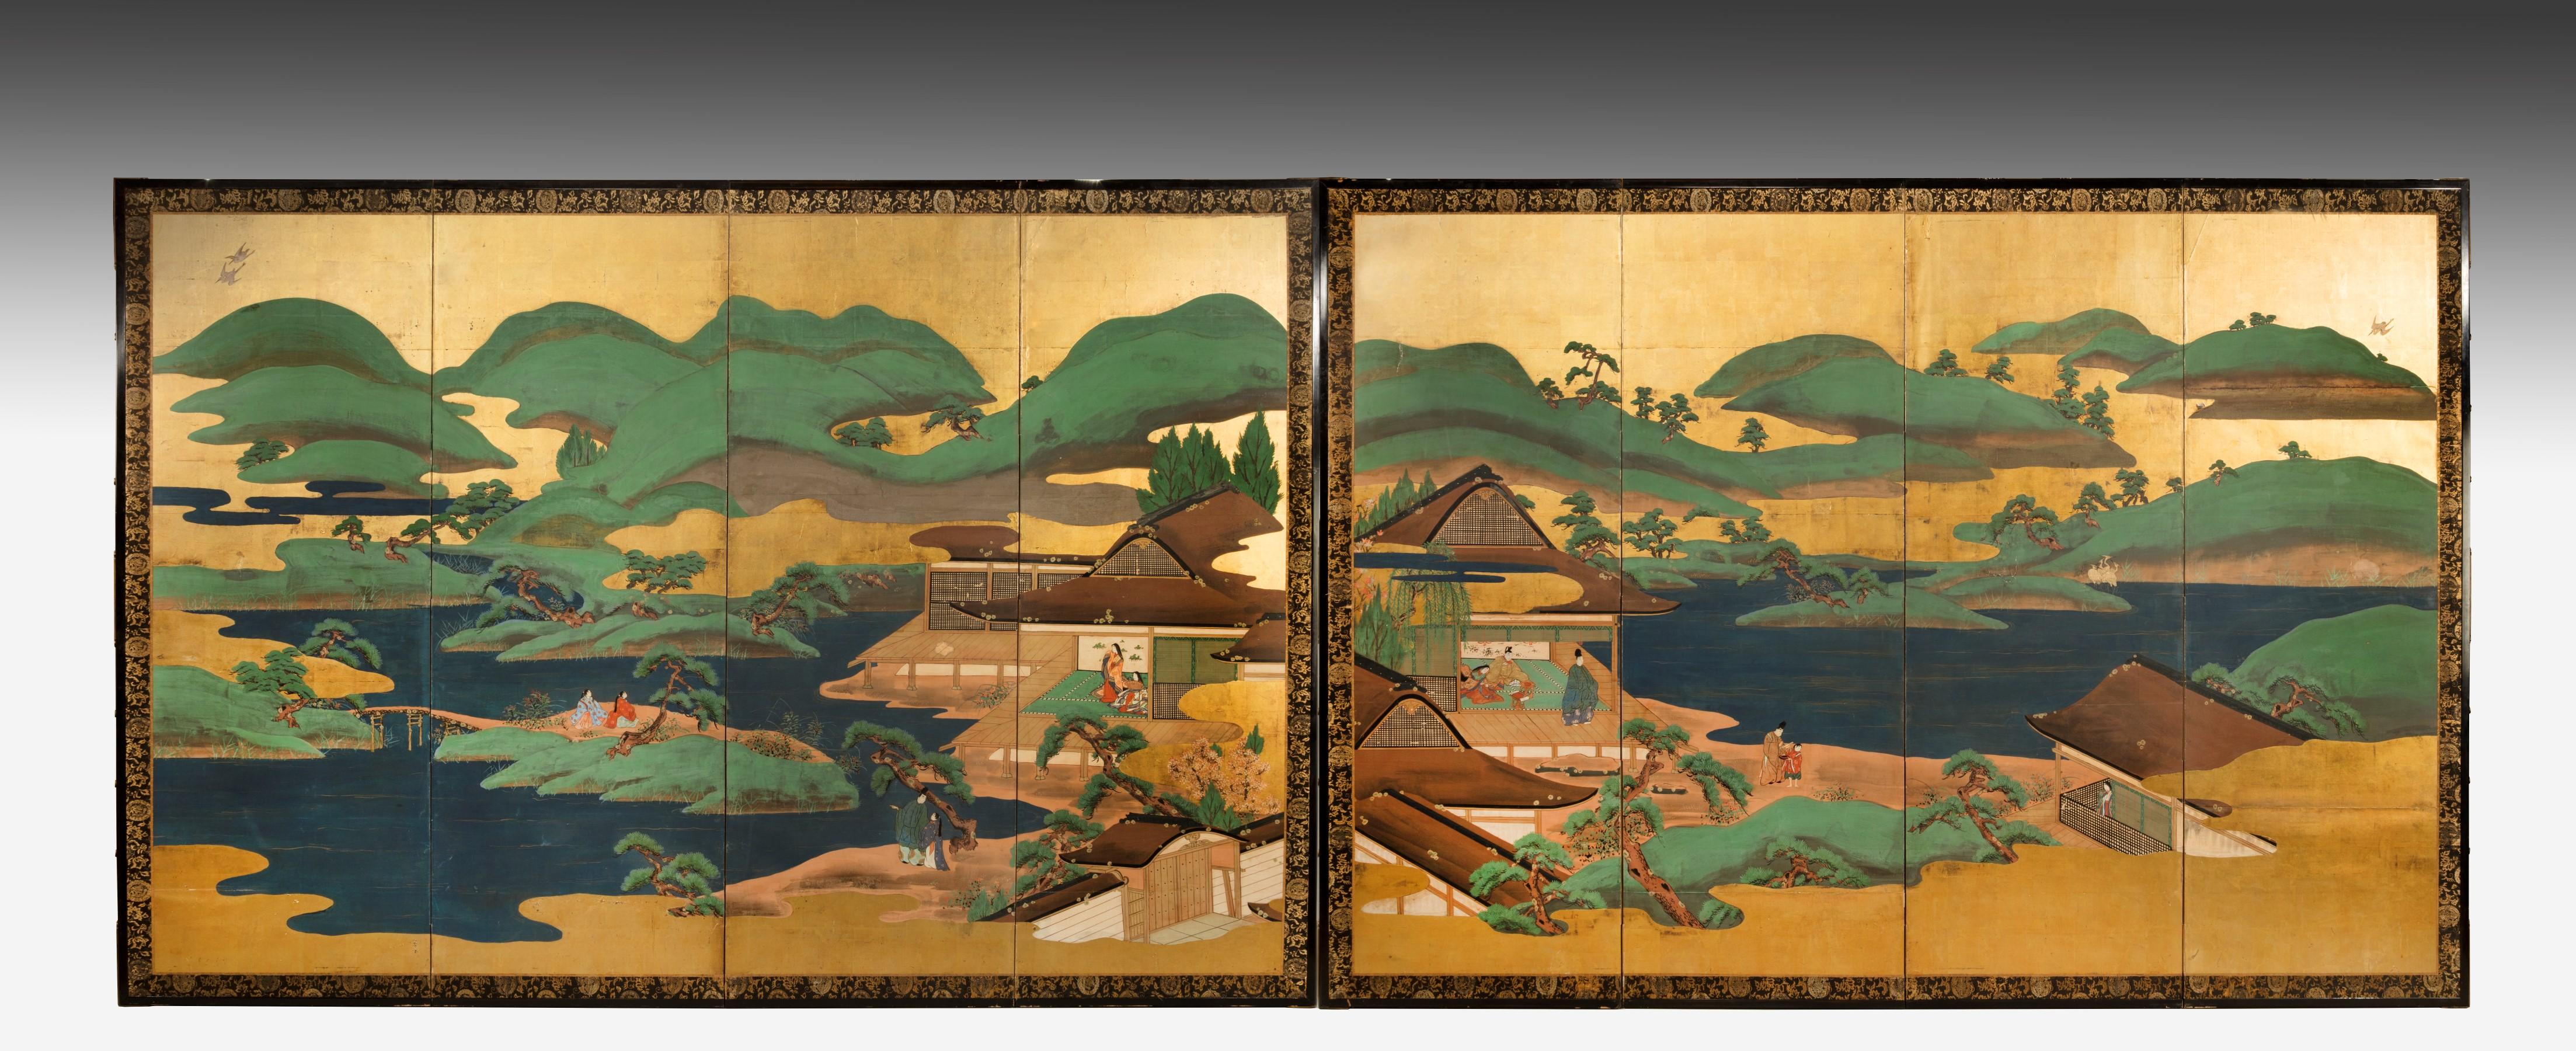 Pair of Japanese screens (c.1830)